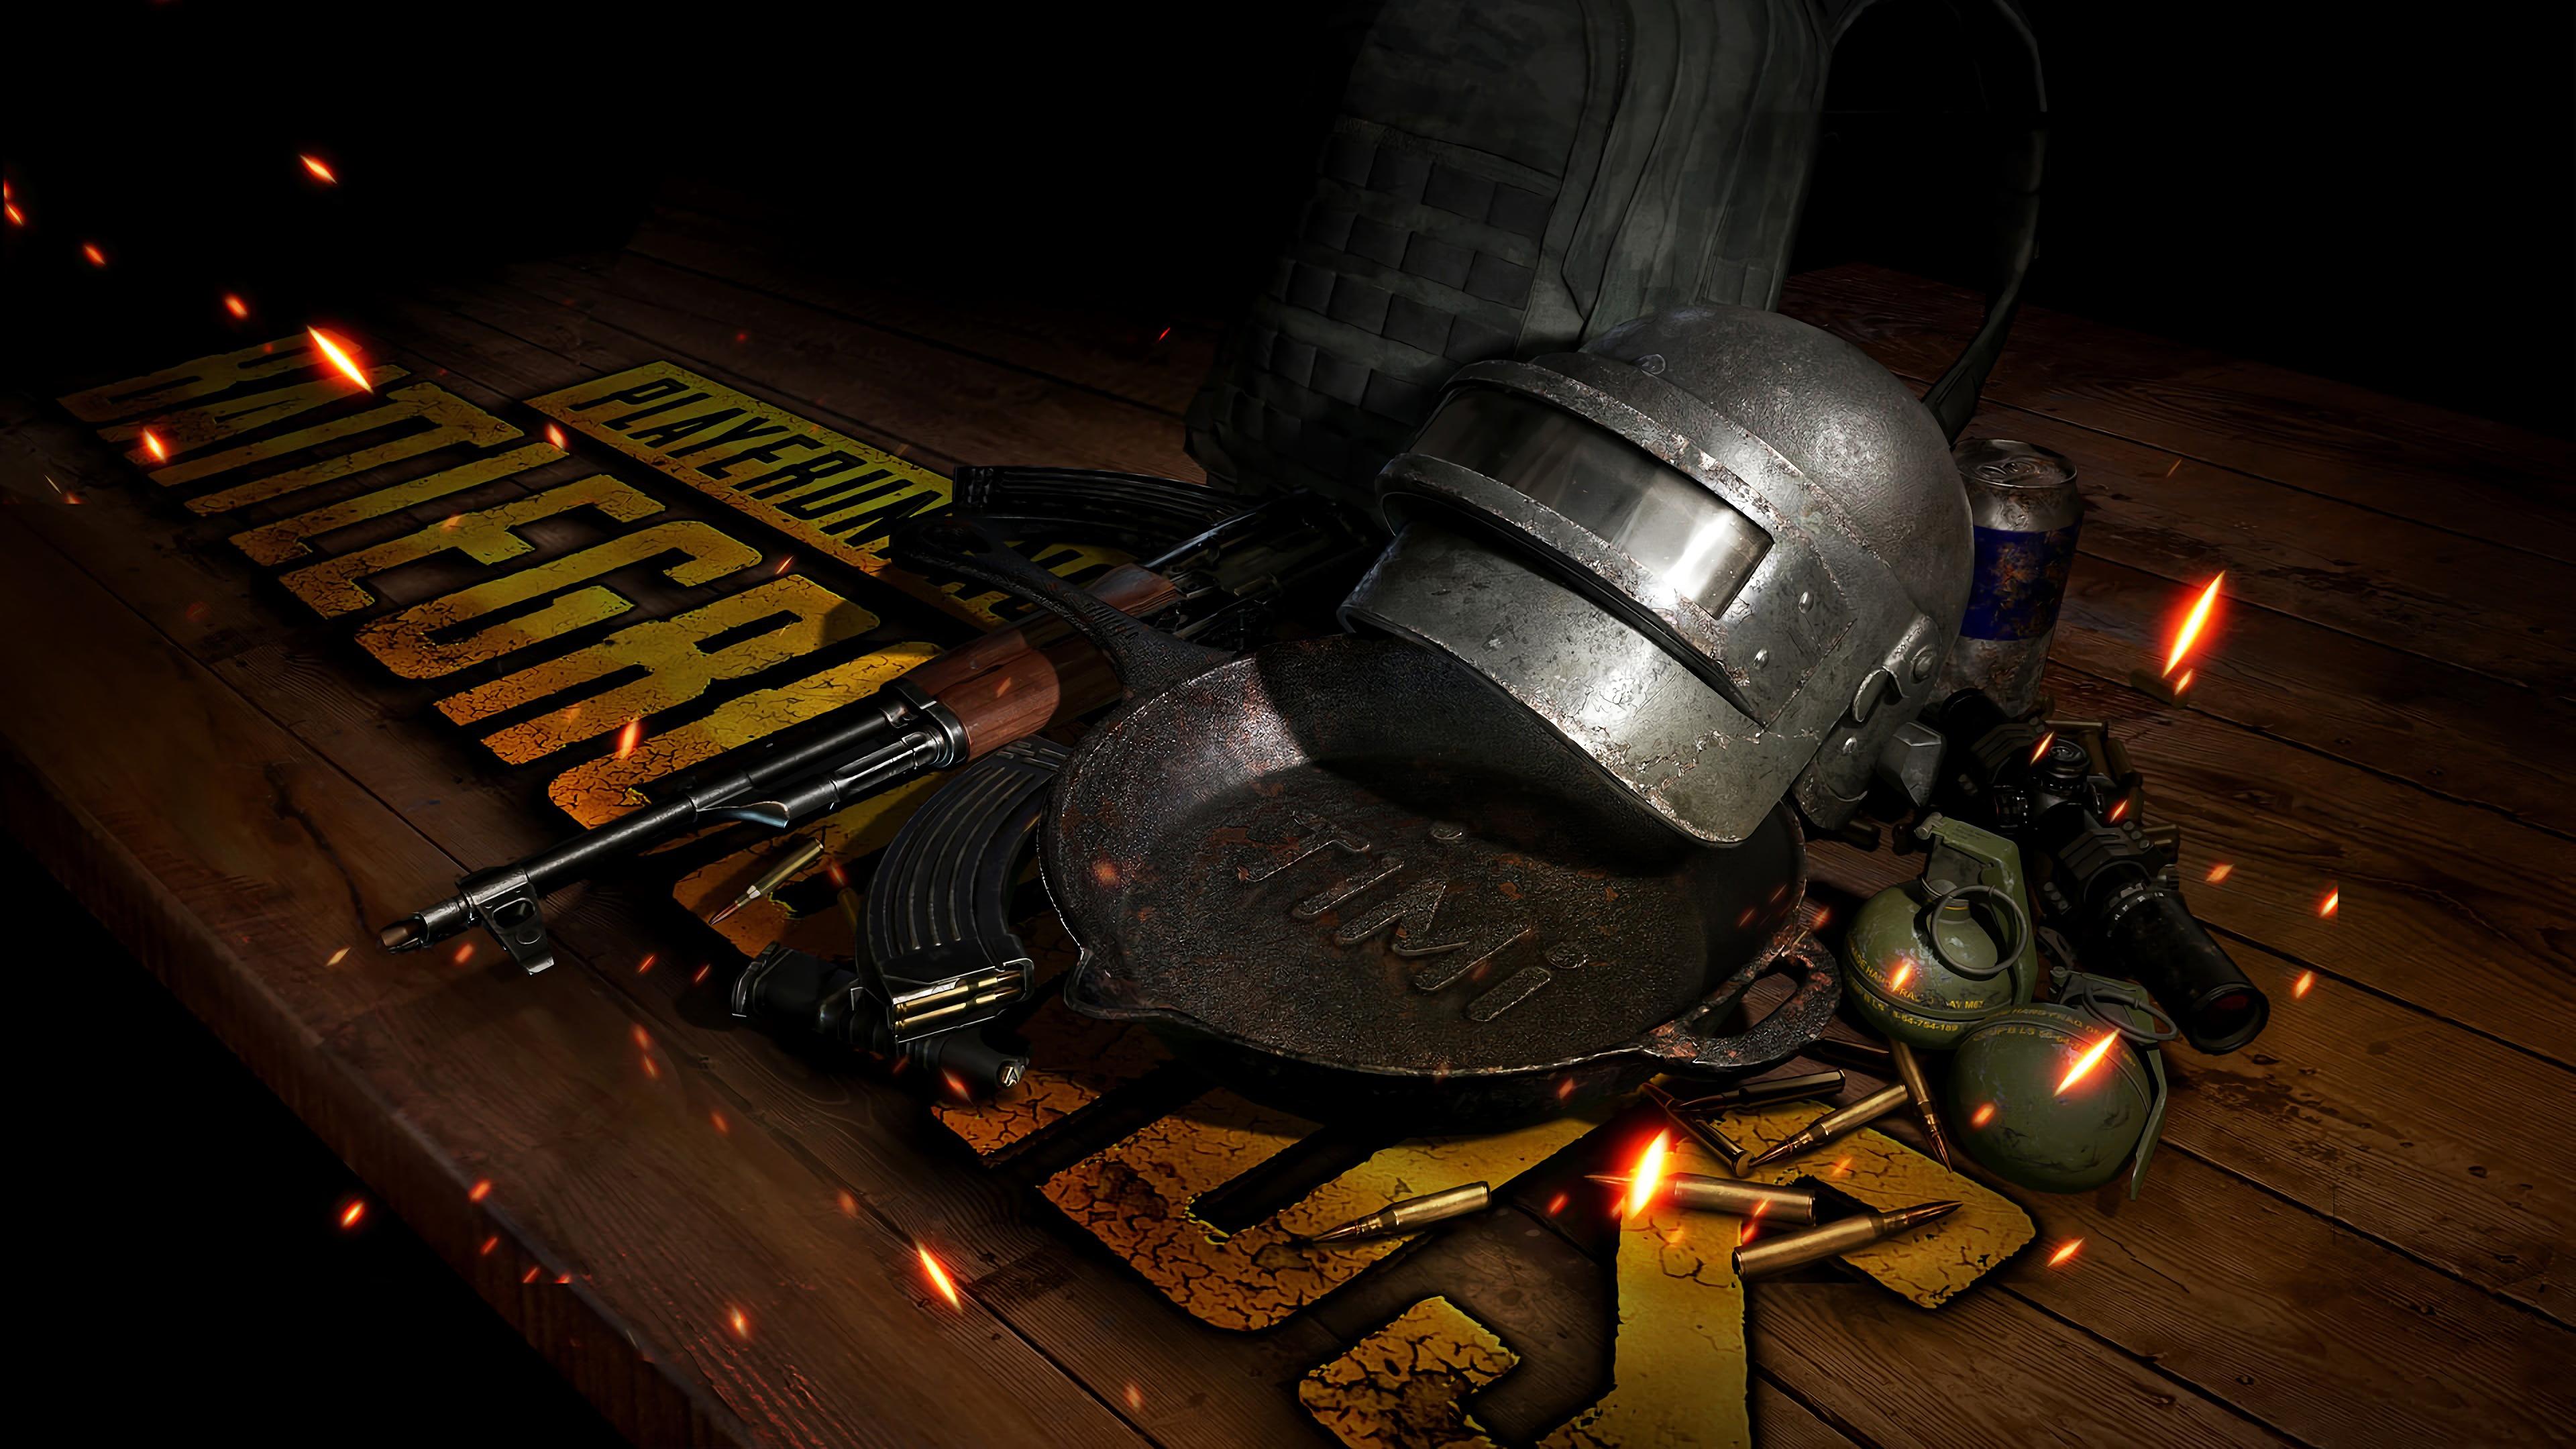 Pubg Wallpaper 4k Pubg Weapons Helmet 4k Hd Games 4k Wallpapers Images